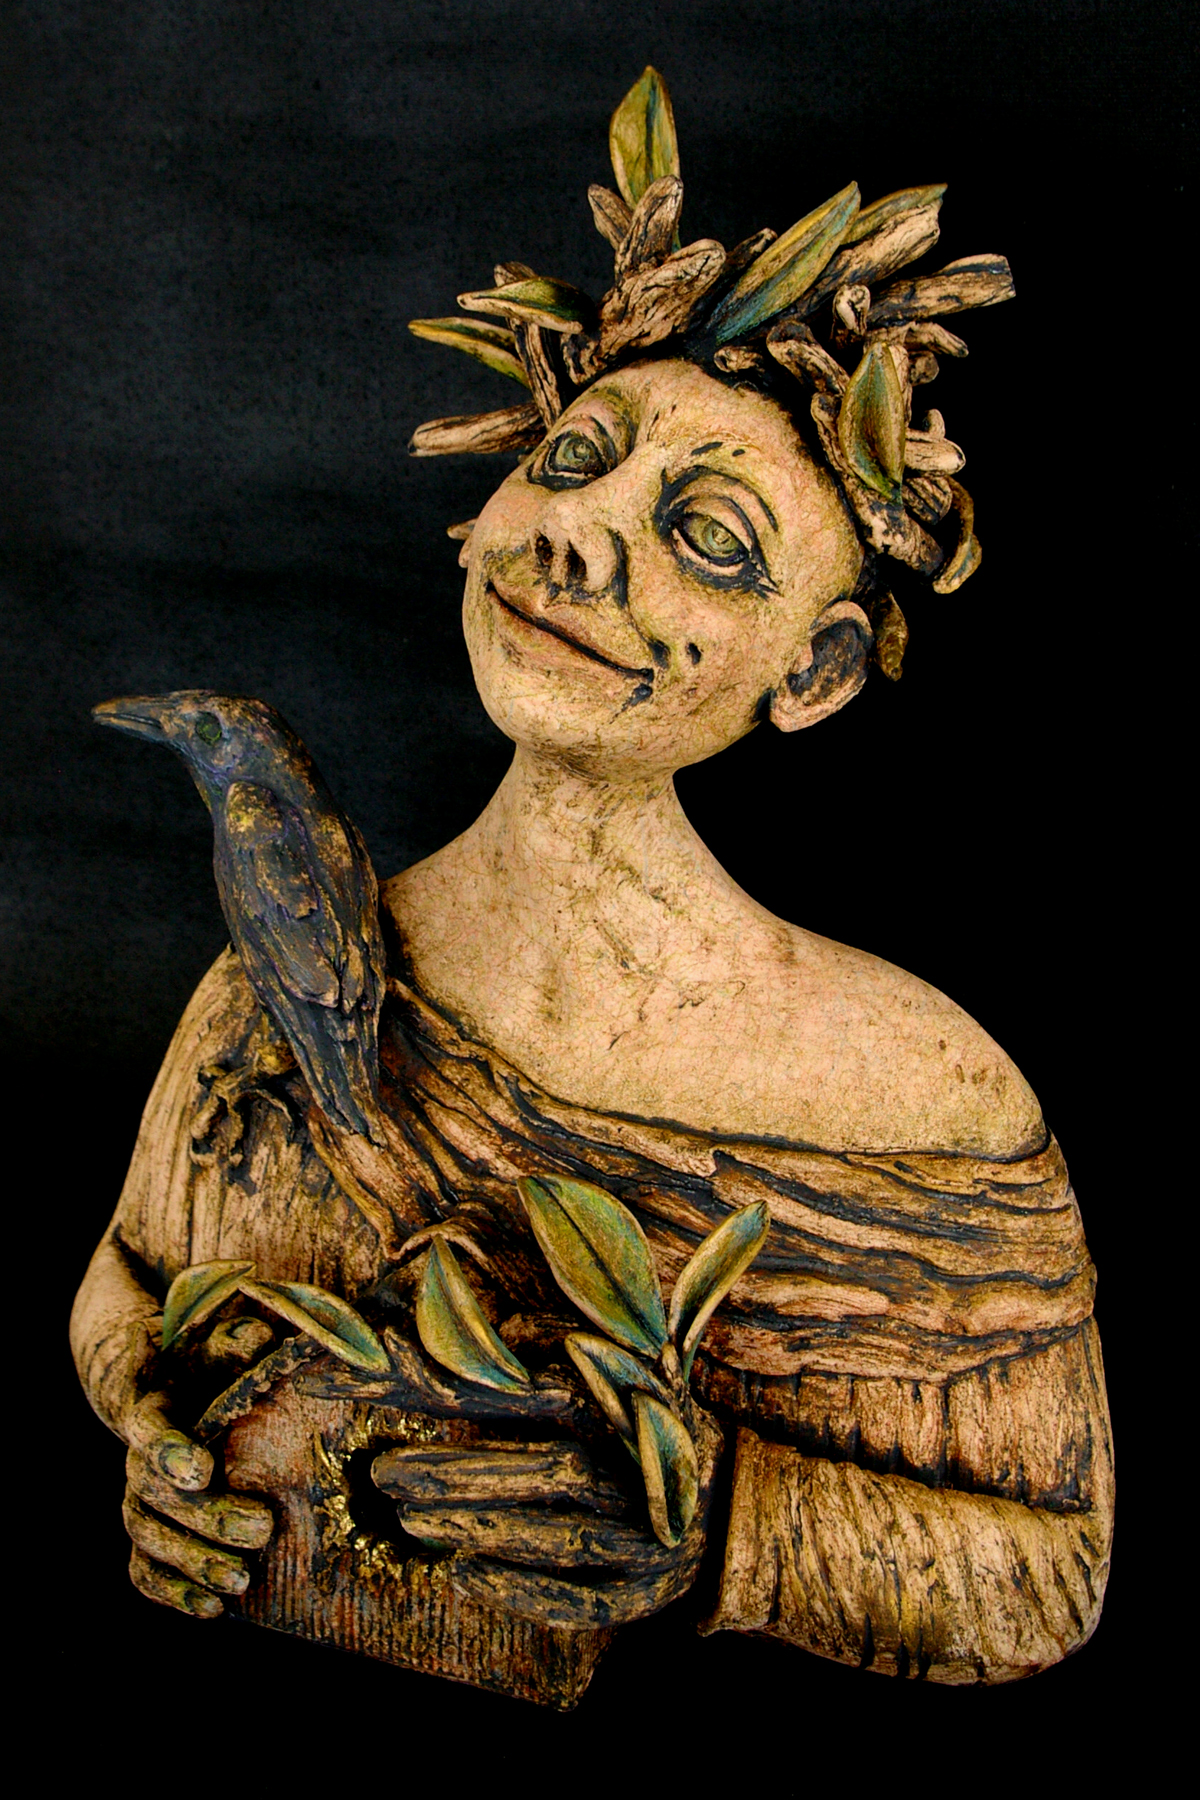 Birdhouse of the Soul